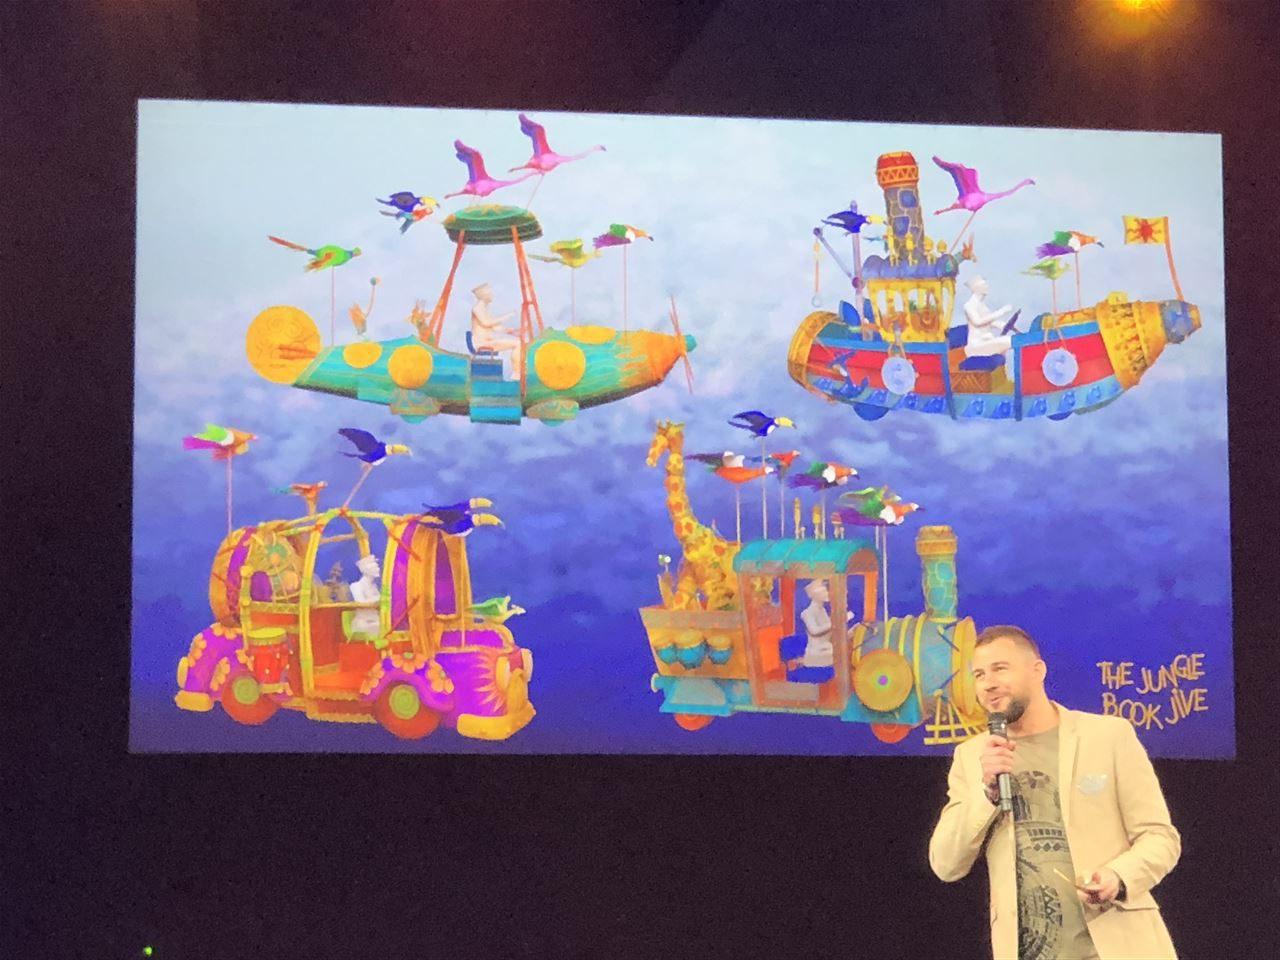 InsidEars Event im Disneyland Paris